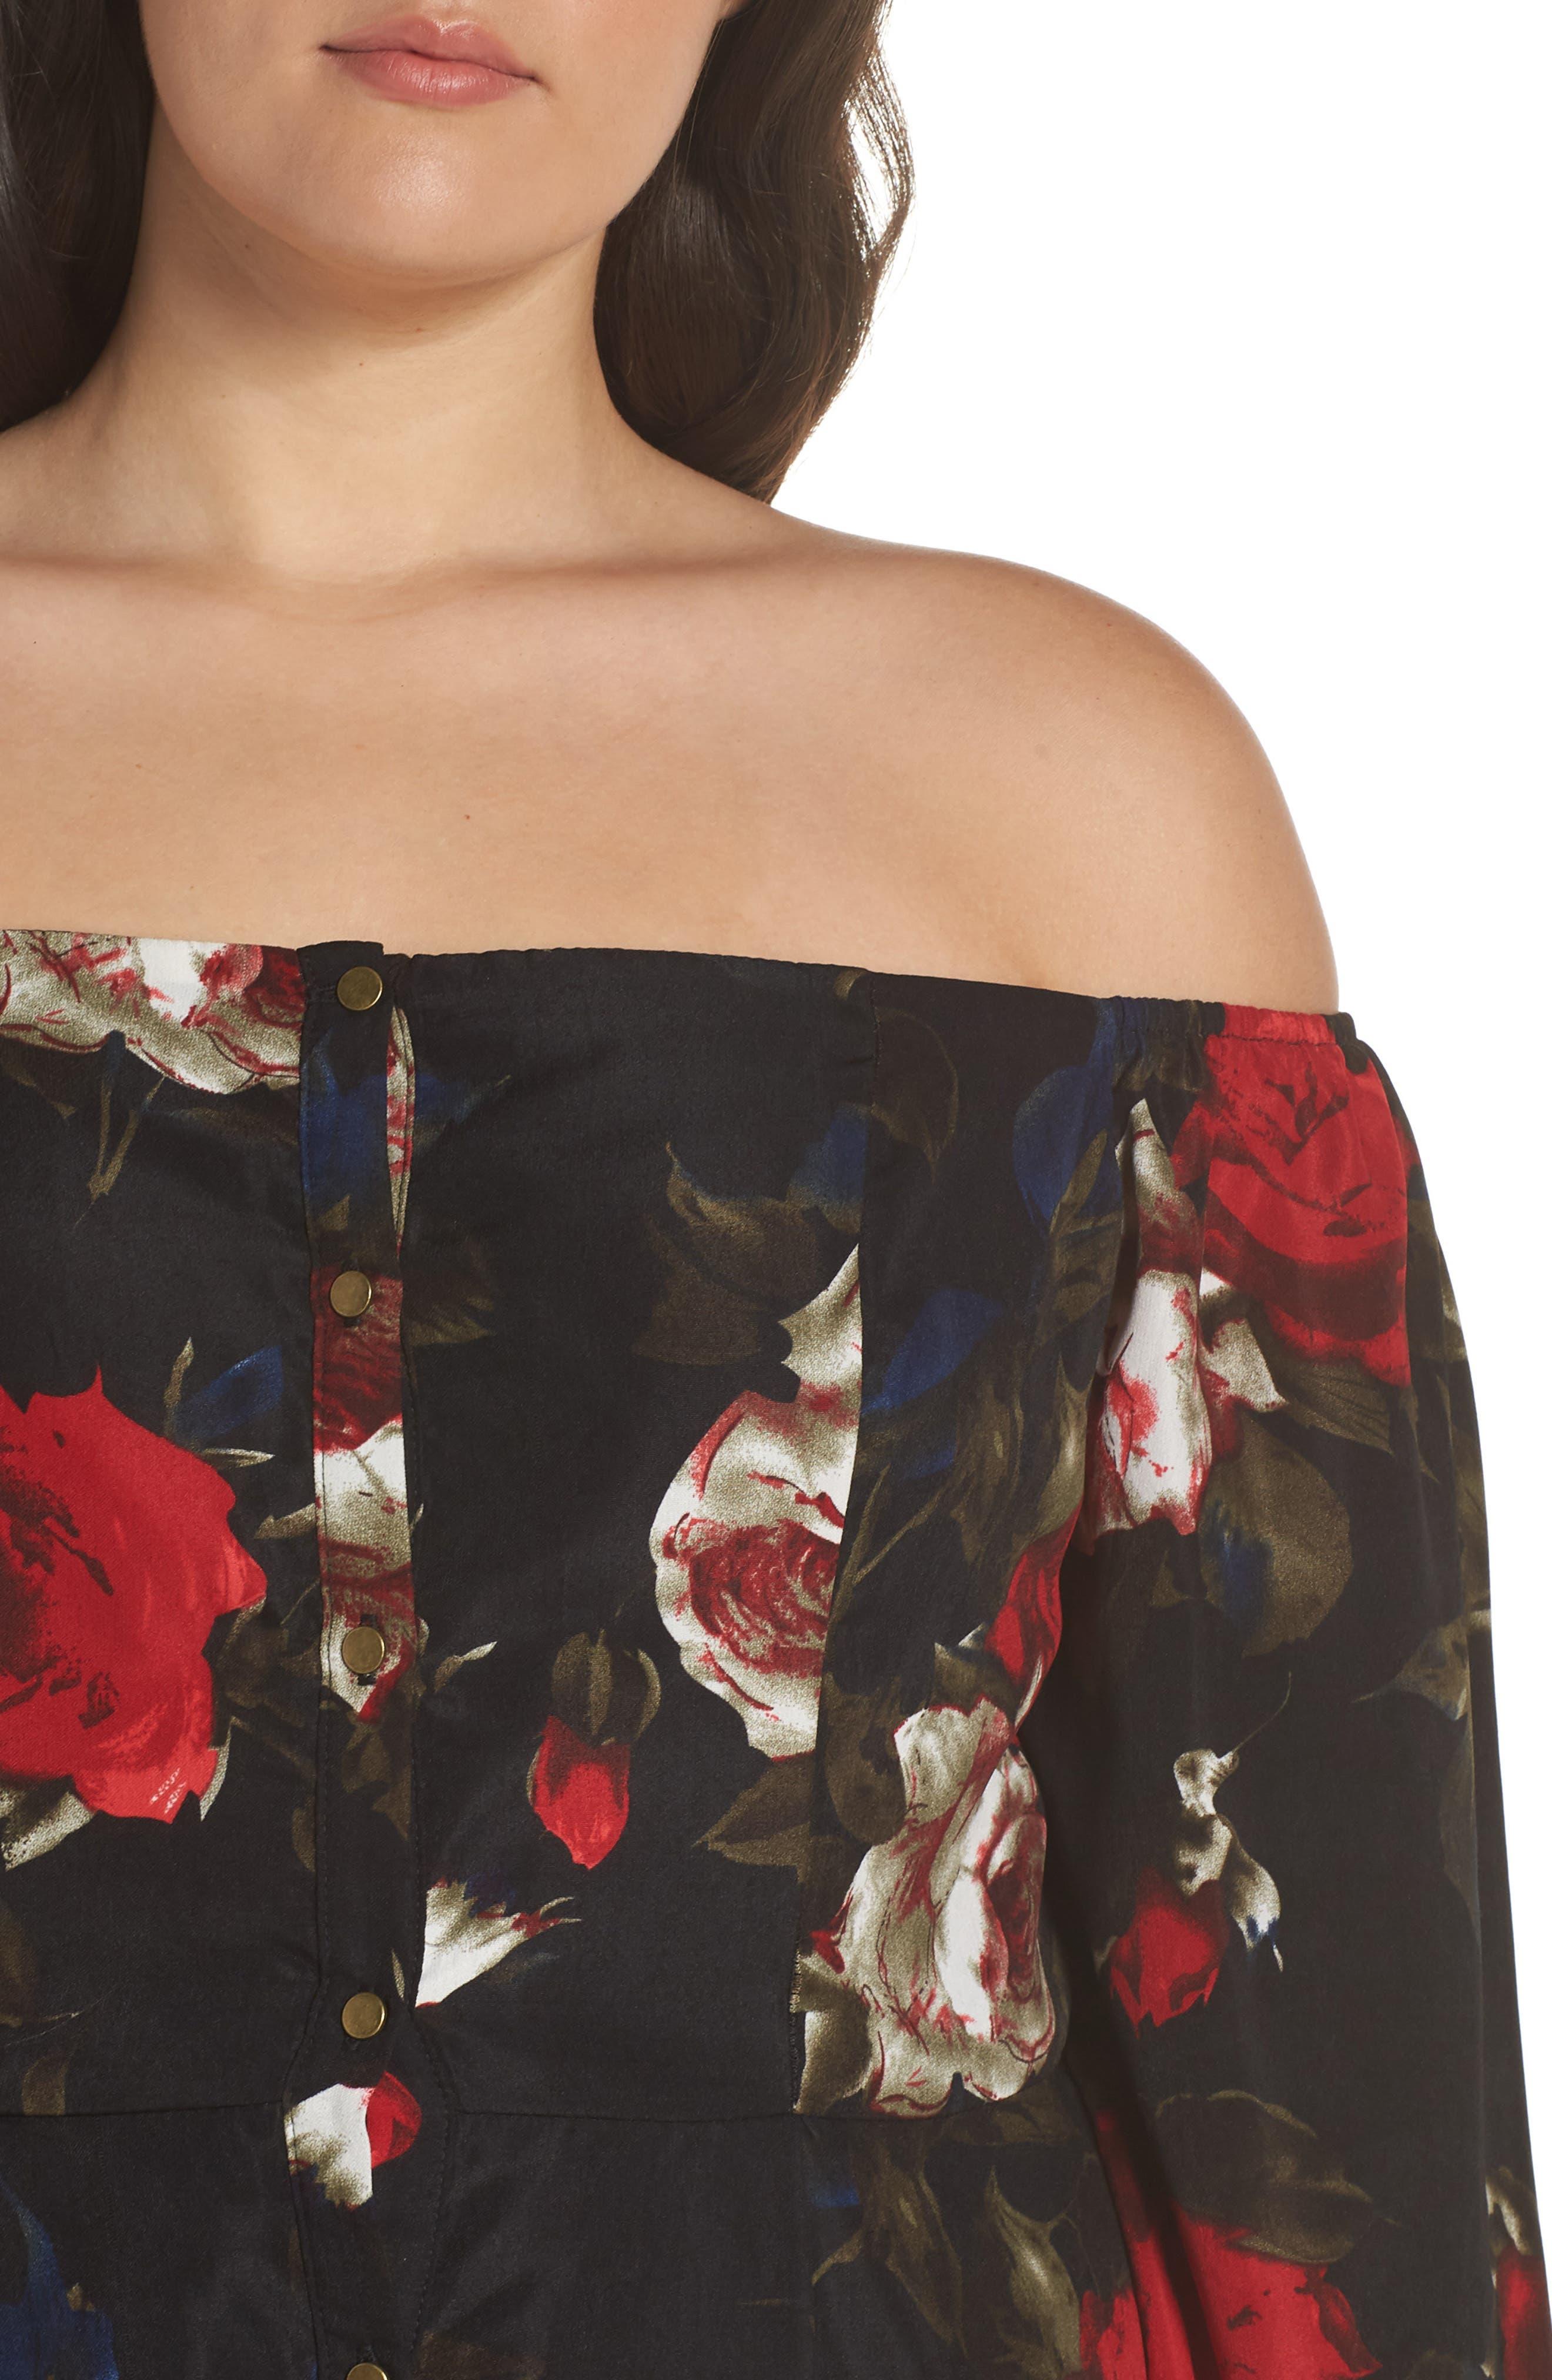 Off the Shoulder Midi Dress,                             Alternate thumbnail 11, color,                             BLACK LUSH ROSE FLORAL